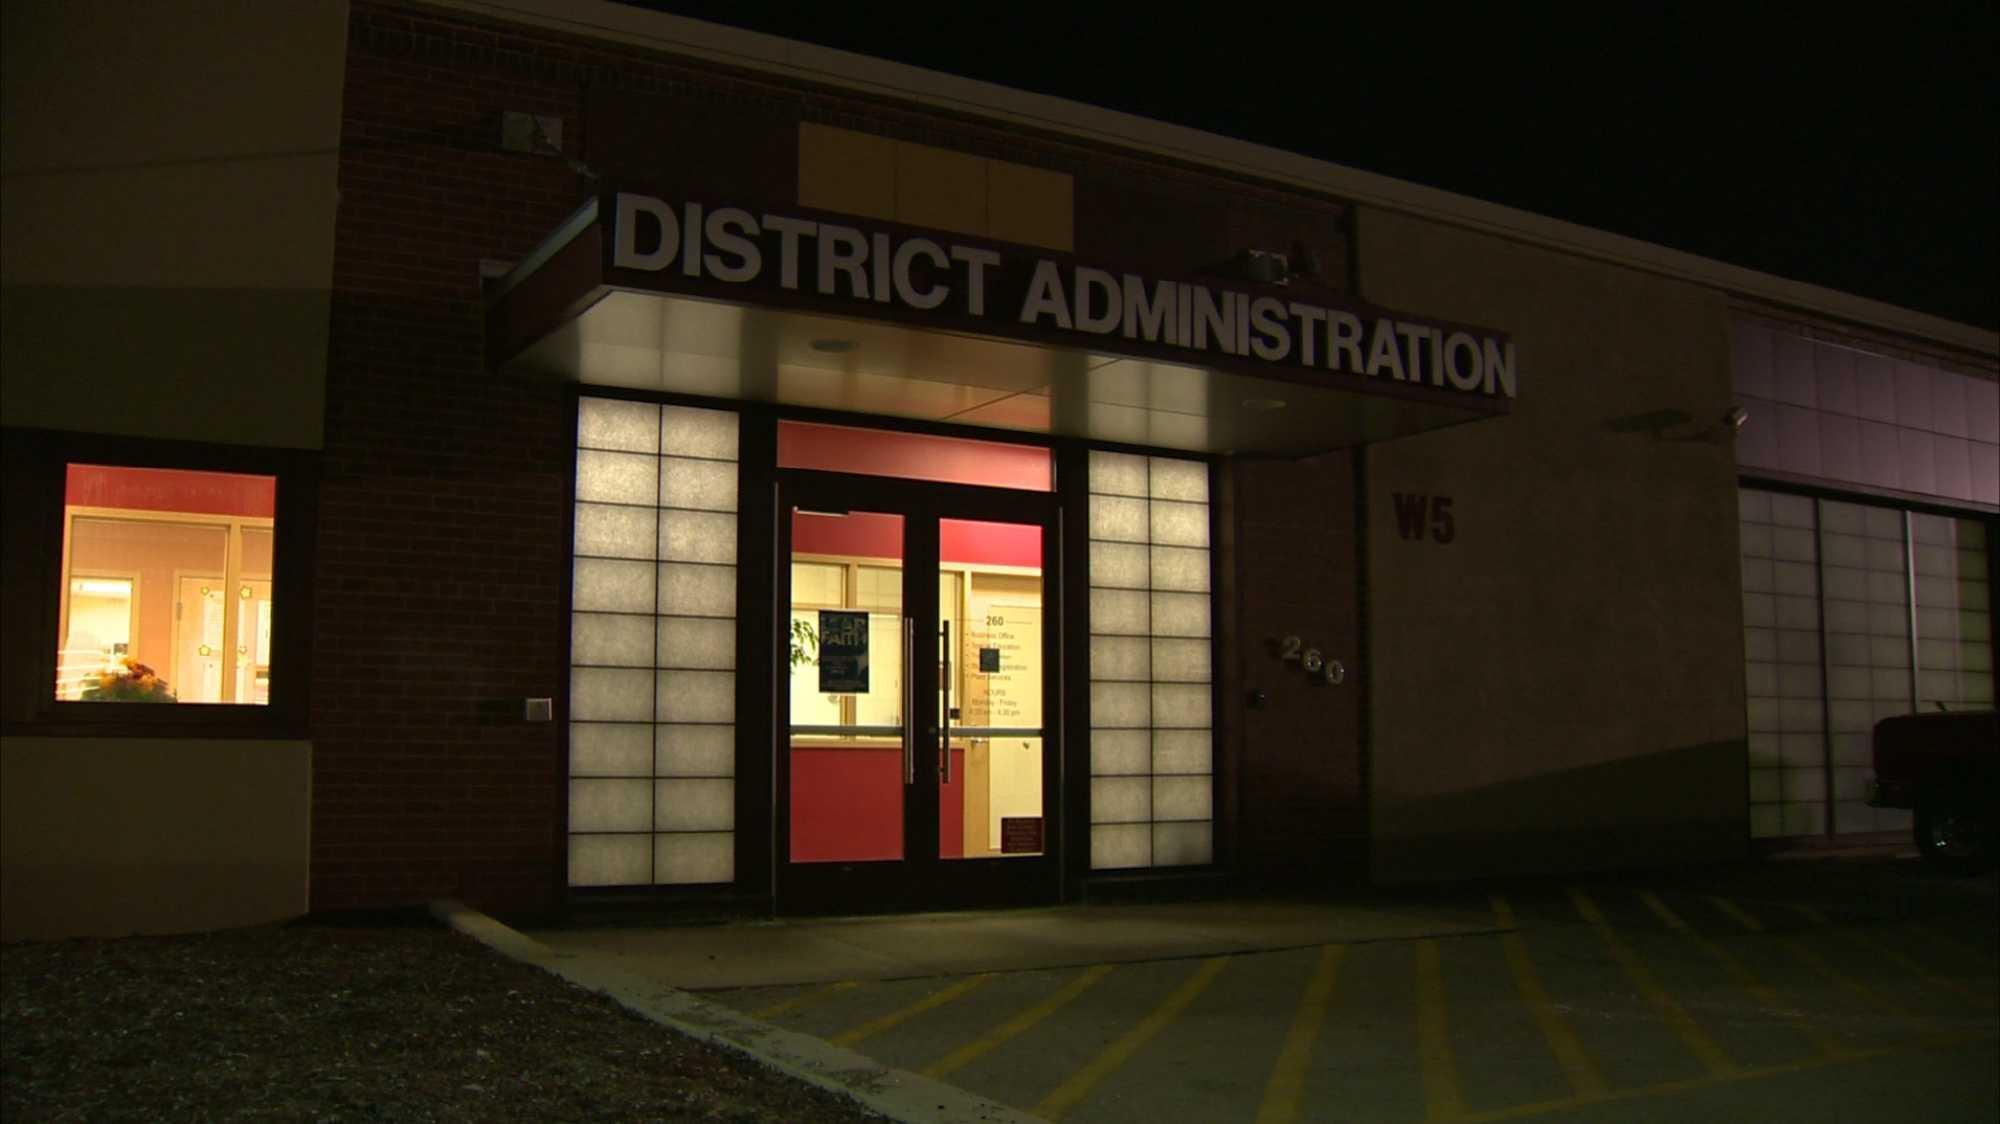 Penn Hills School District administration building